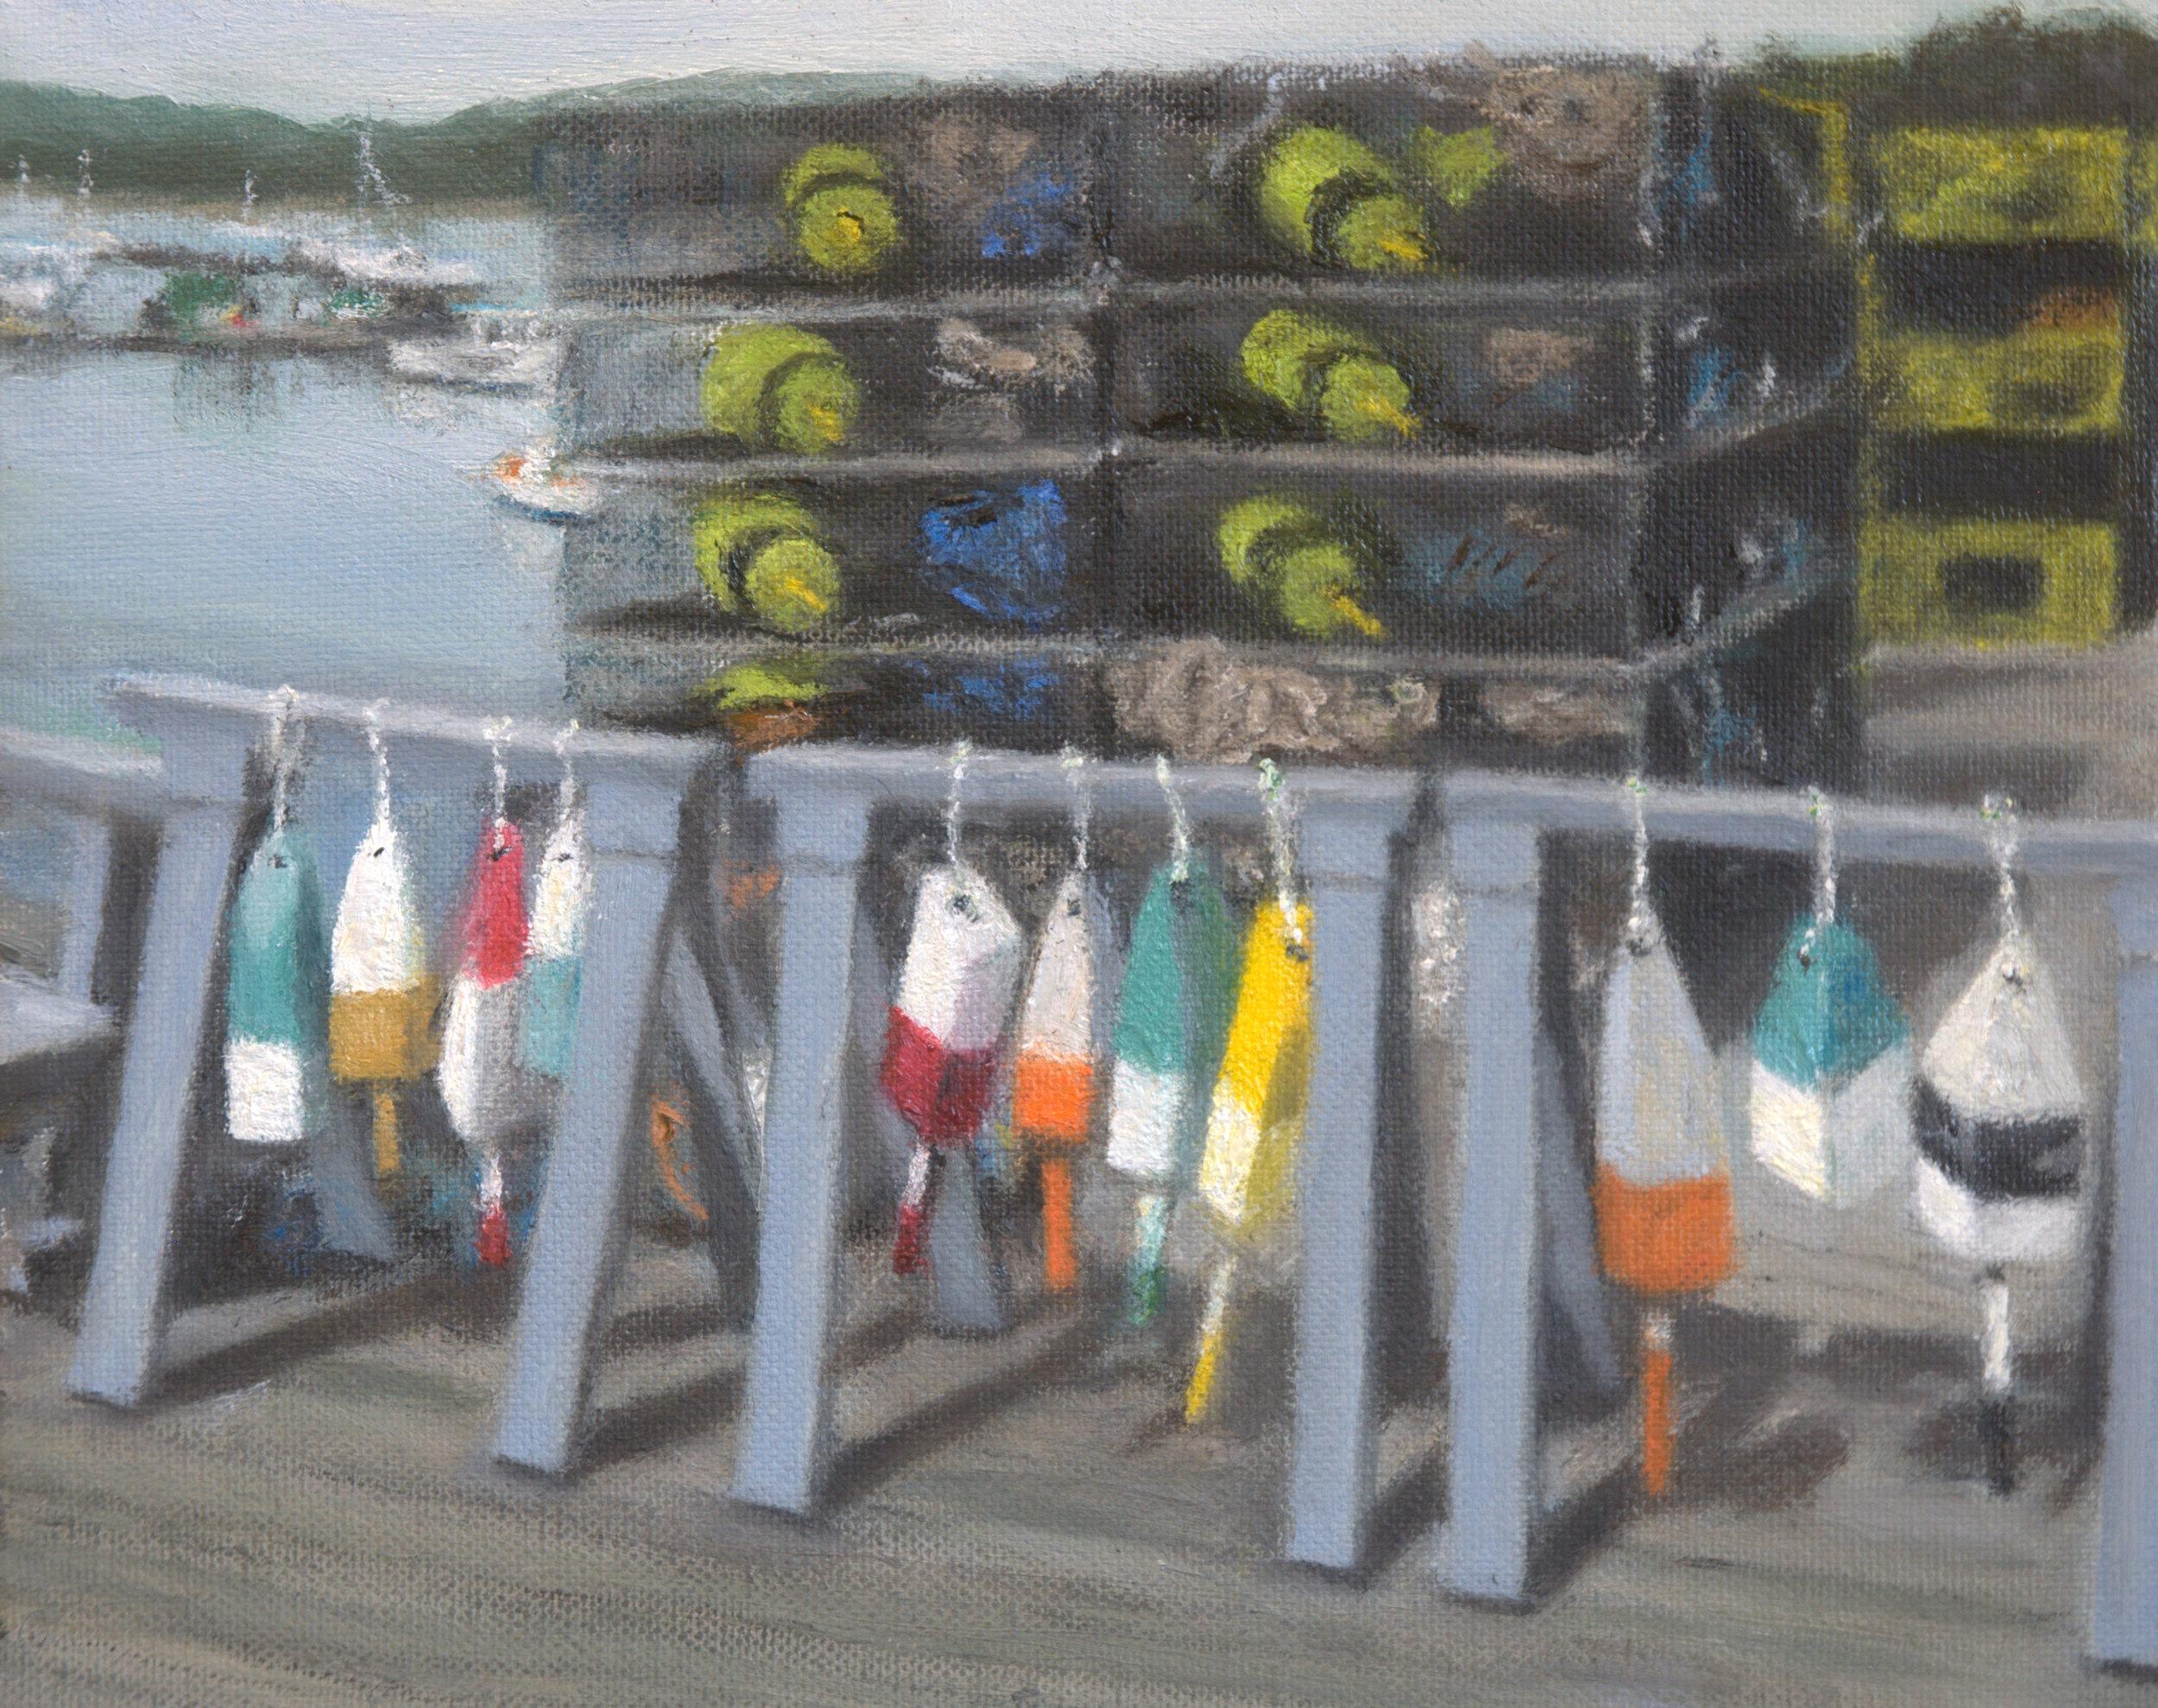 Buoys on the Dock